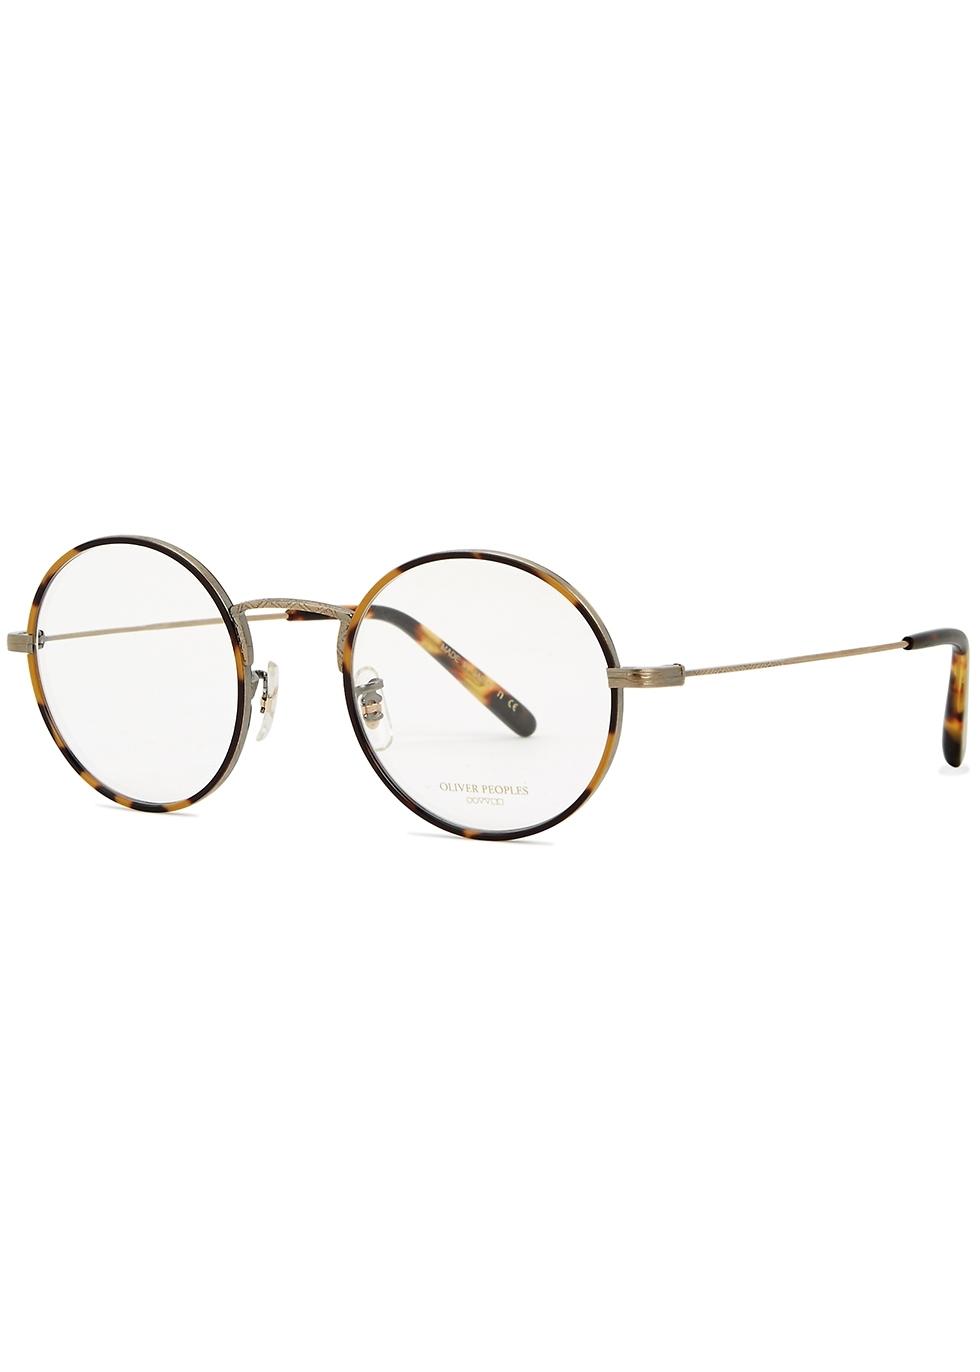 a53abafeac07 Men s Designer Sunglasses   Eyewear - Harvey Nichols